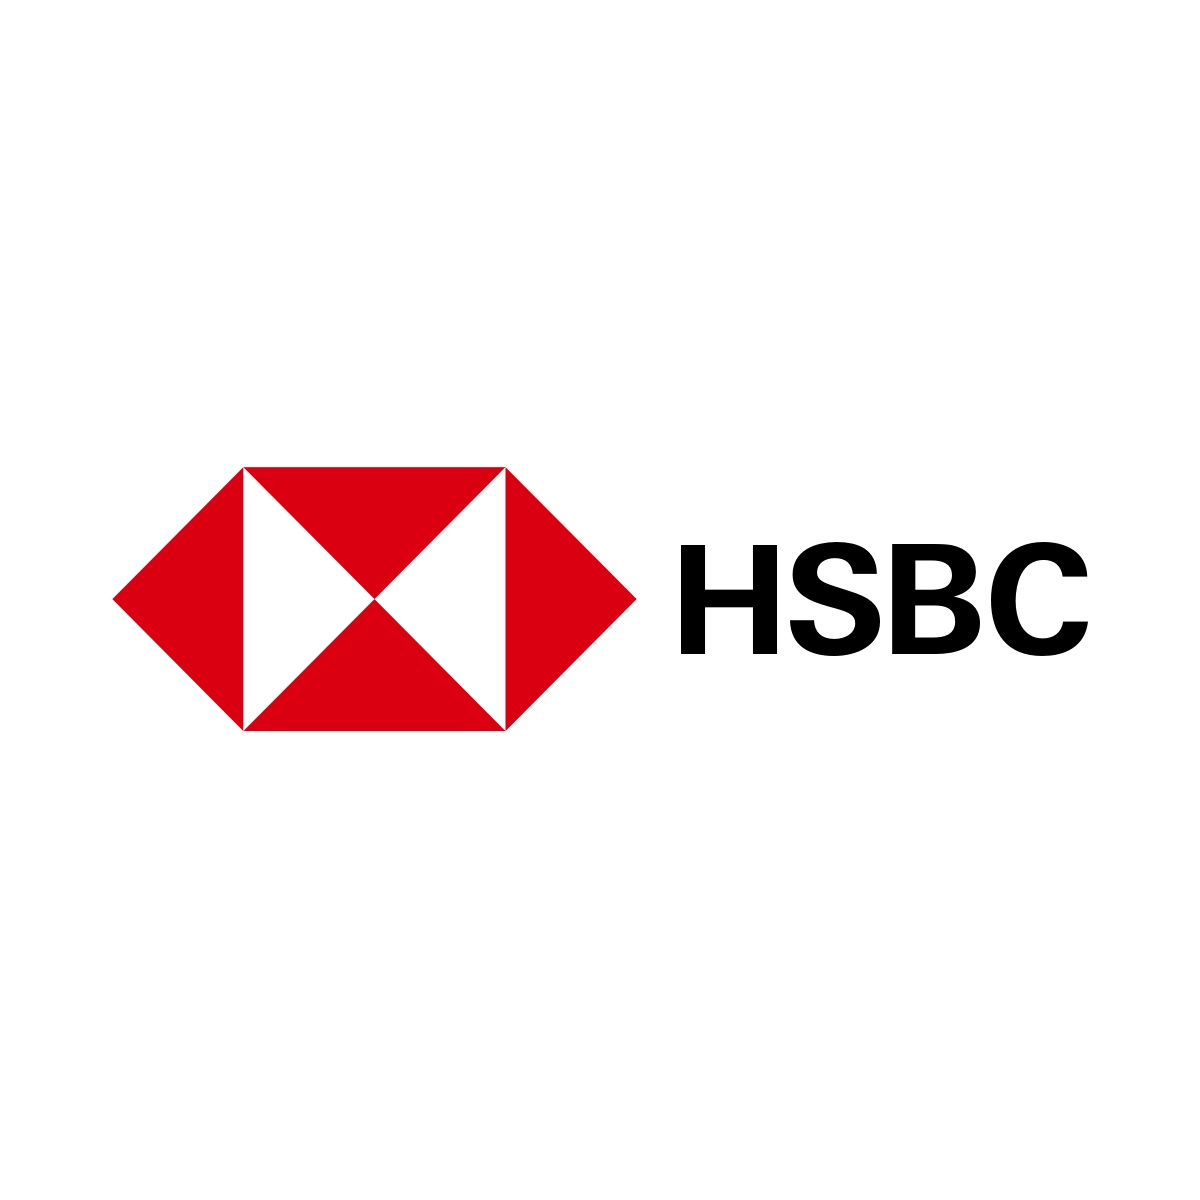 HSBC Malta - Credit Cards, Accounts, Loans | Bank in Malta